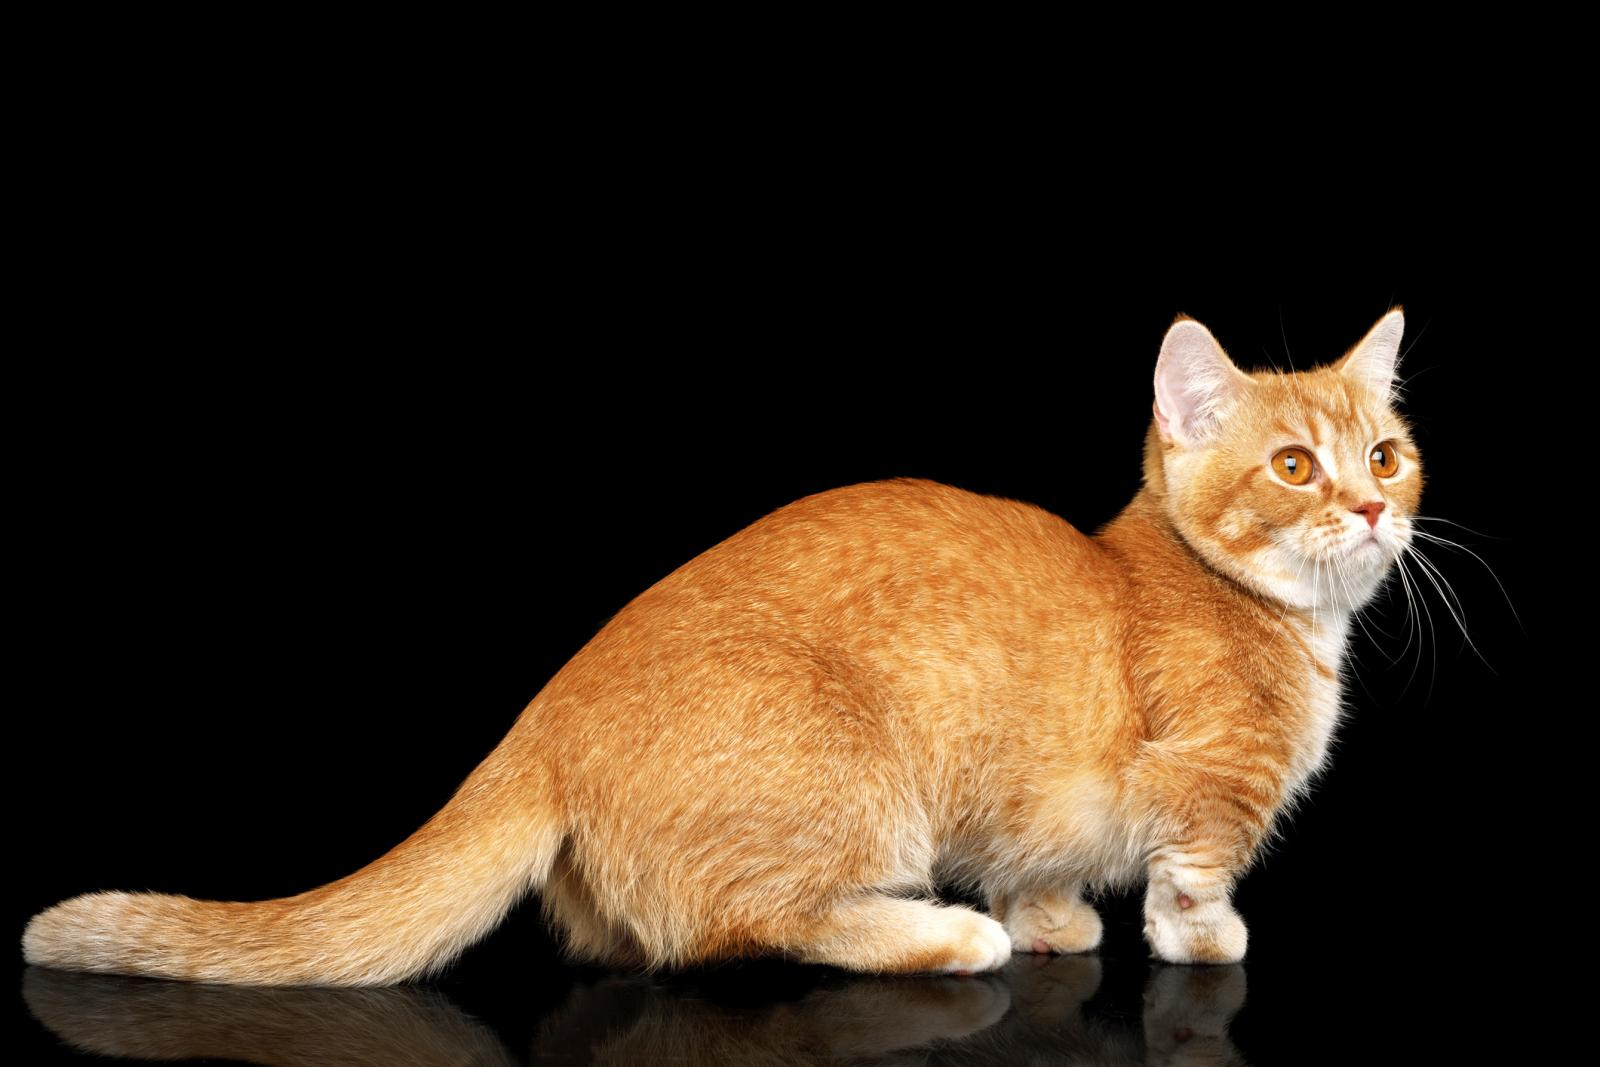 Ginger munchkin cat